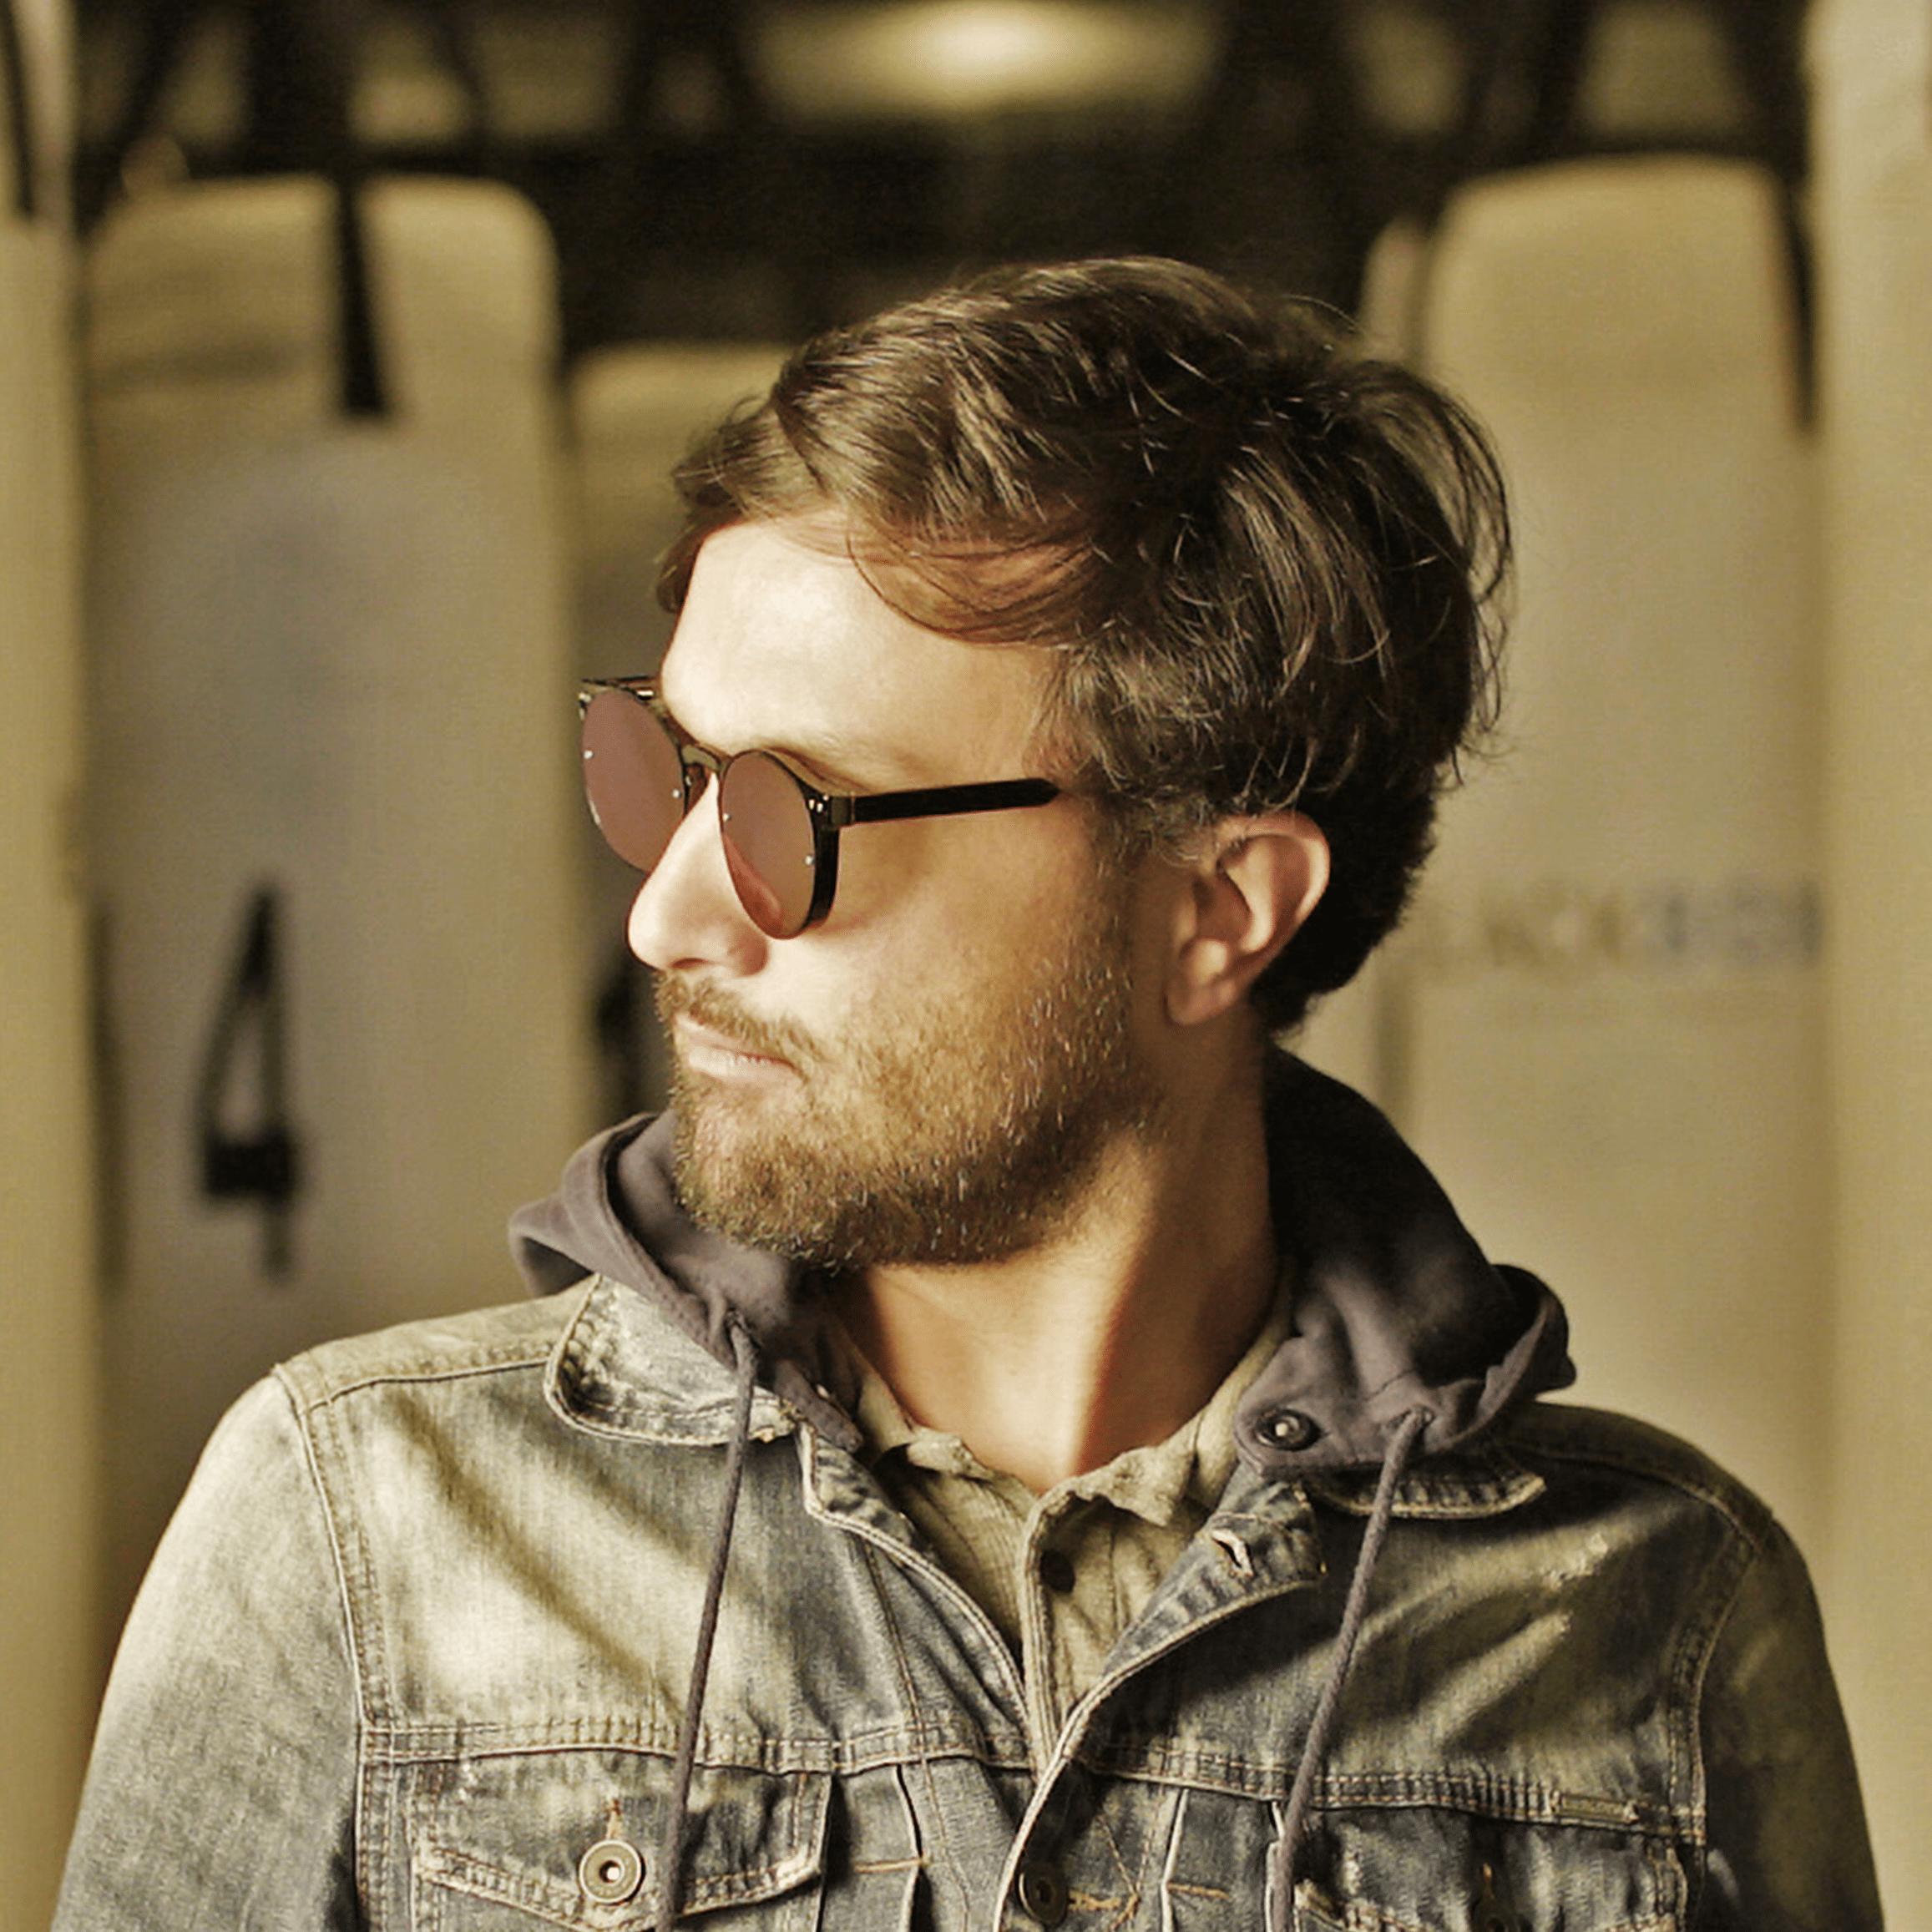 Daniel Alejandro Ramírez Rico